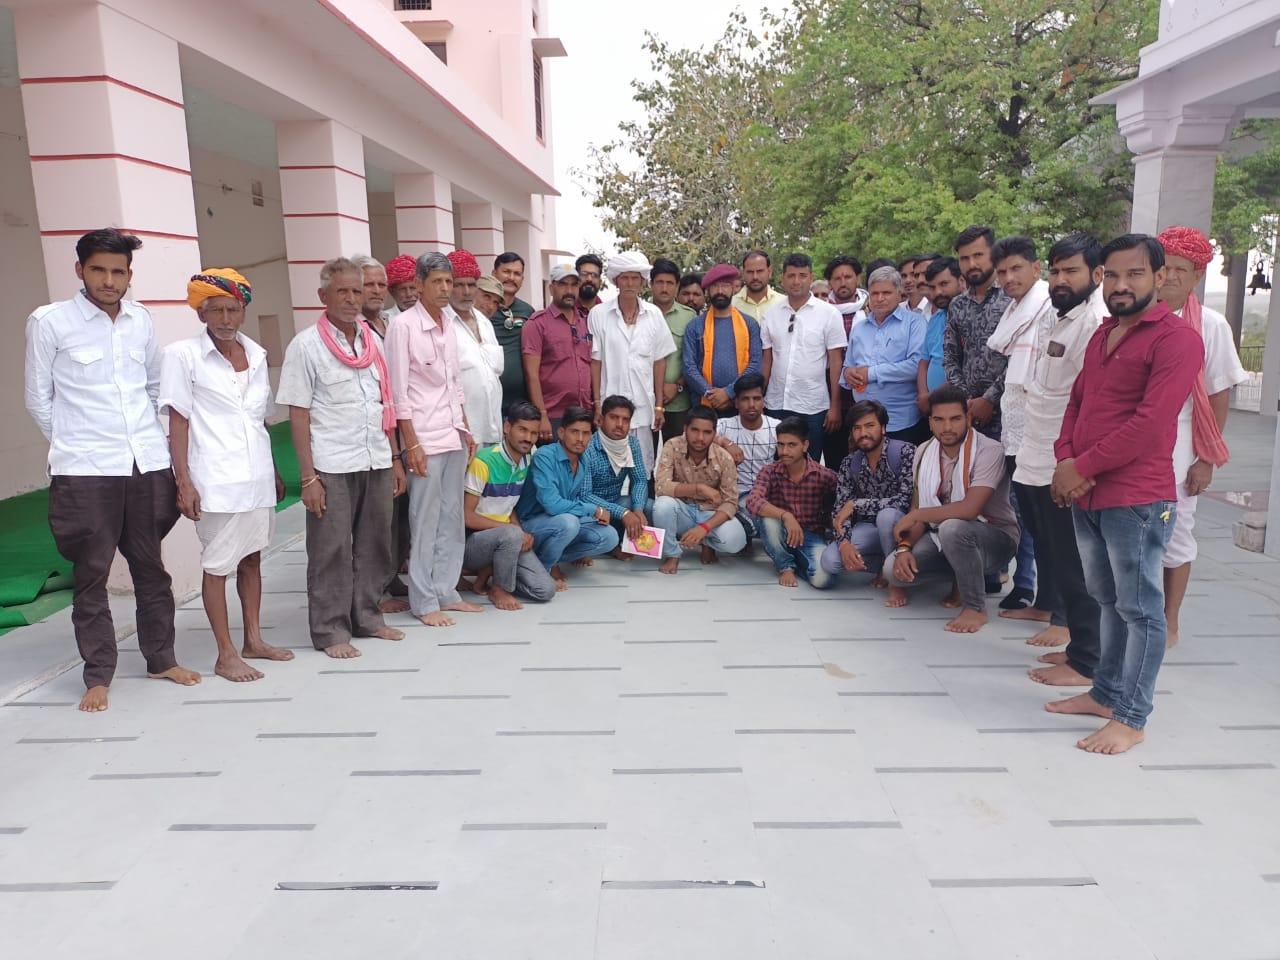 मिशन 09 मई महाराणा प्रताप जन्मोत्सव कुंभलगढ़  पूर्व तैयारी हेतु बेठक हुई सम्पन्न